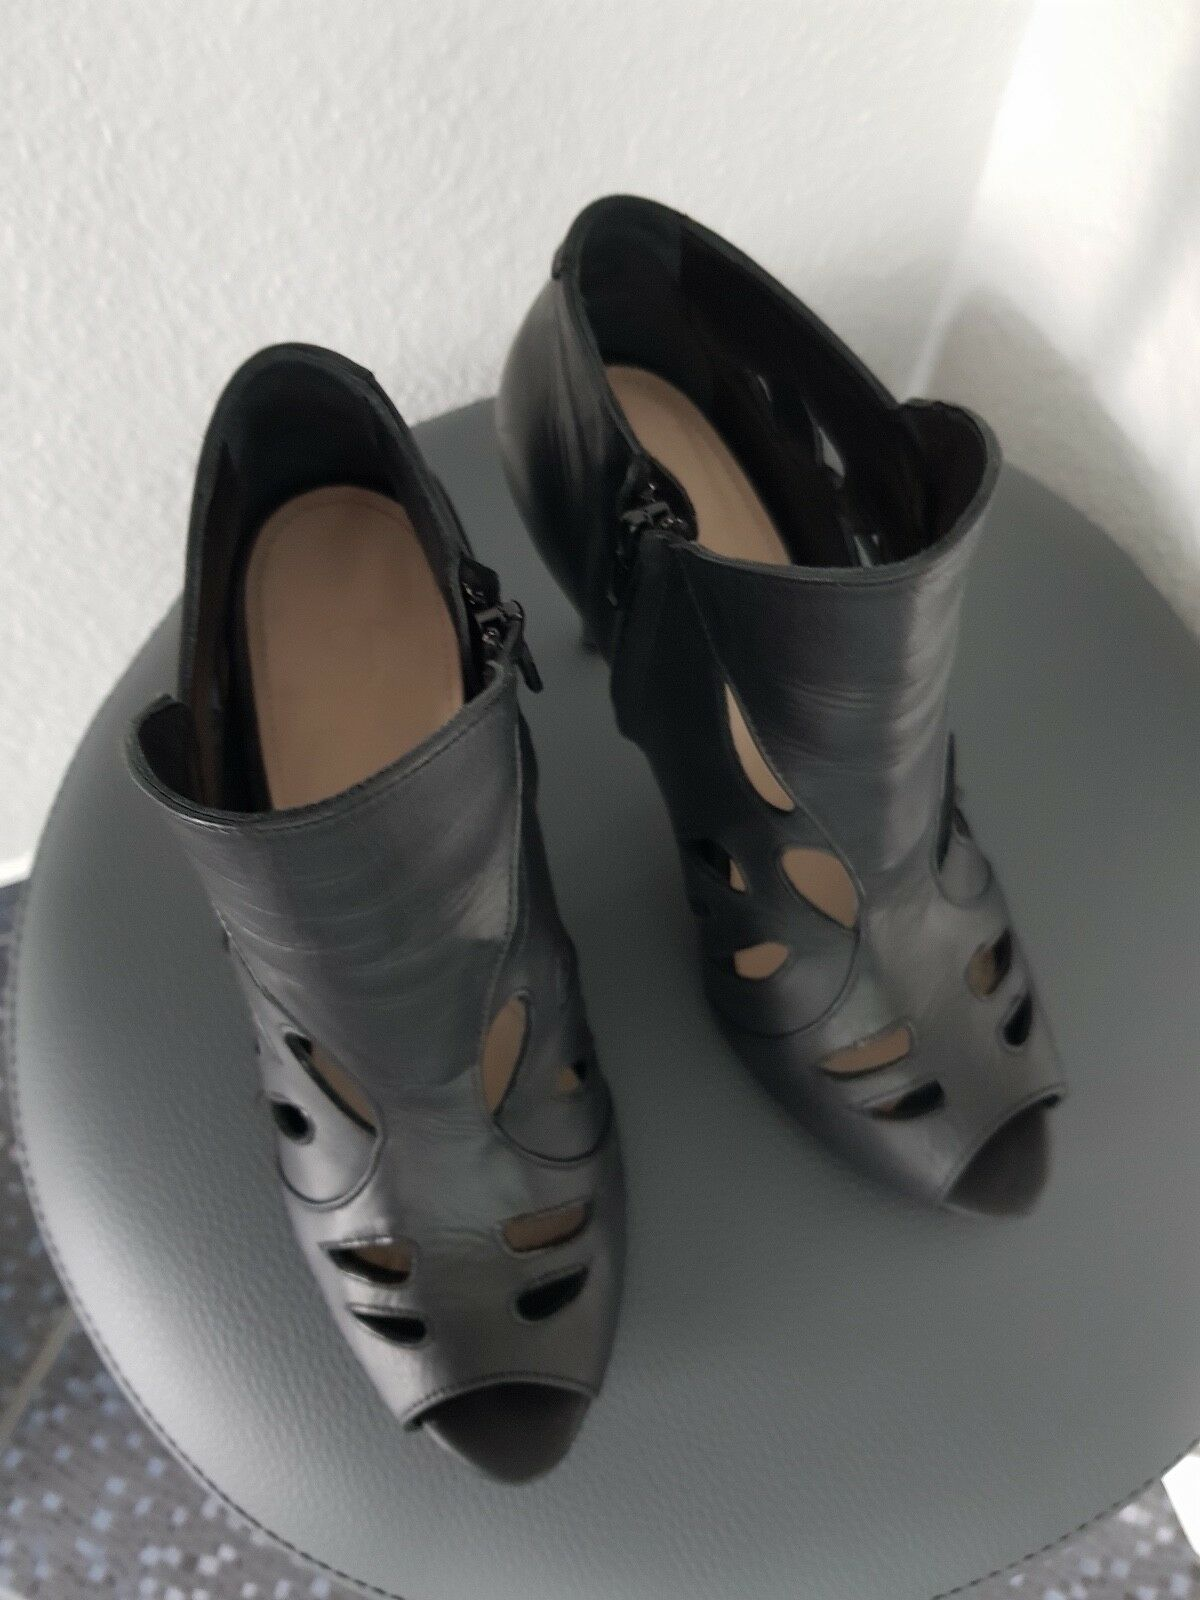 SUPERTRASH Booties Sandaletten Booties SUPERTRASH Schwarz Leder Gr. 40 45dac5